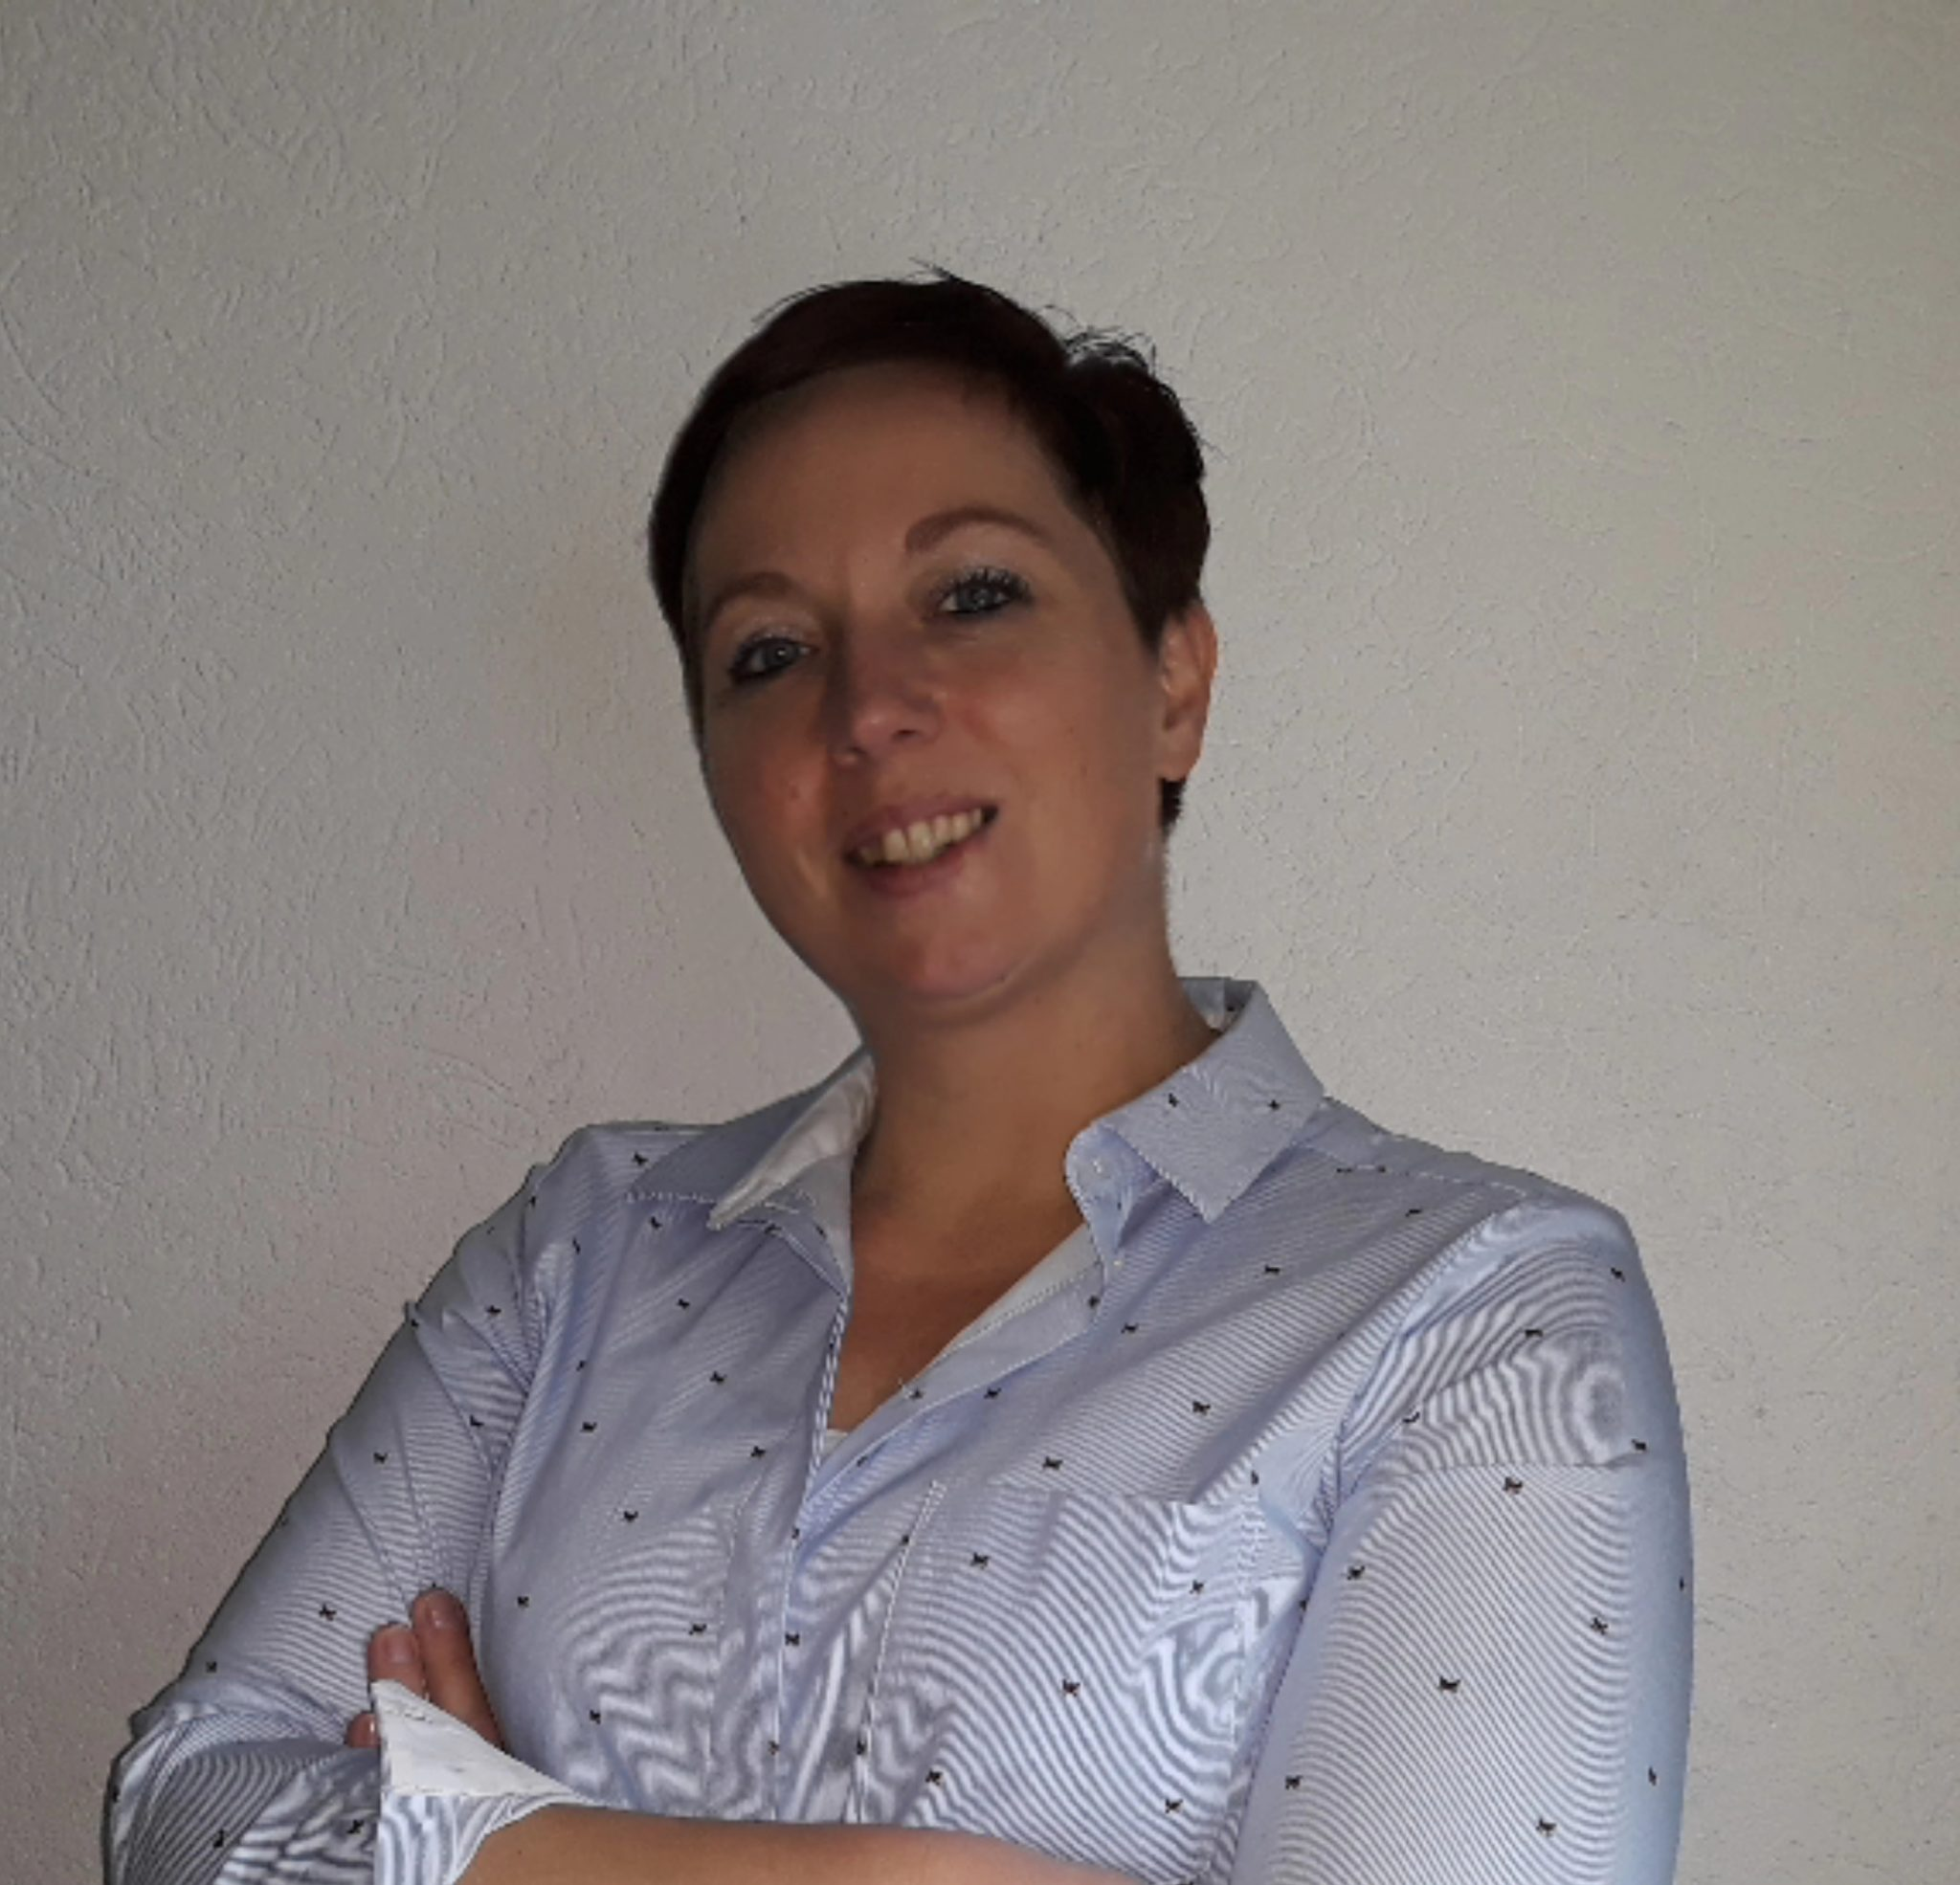 Bianca van der Weiden-Nijhof